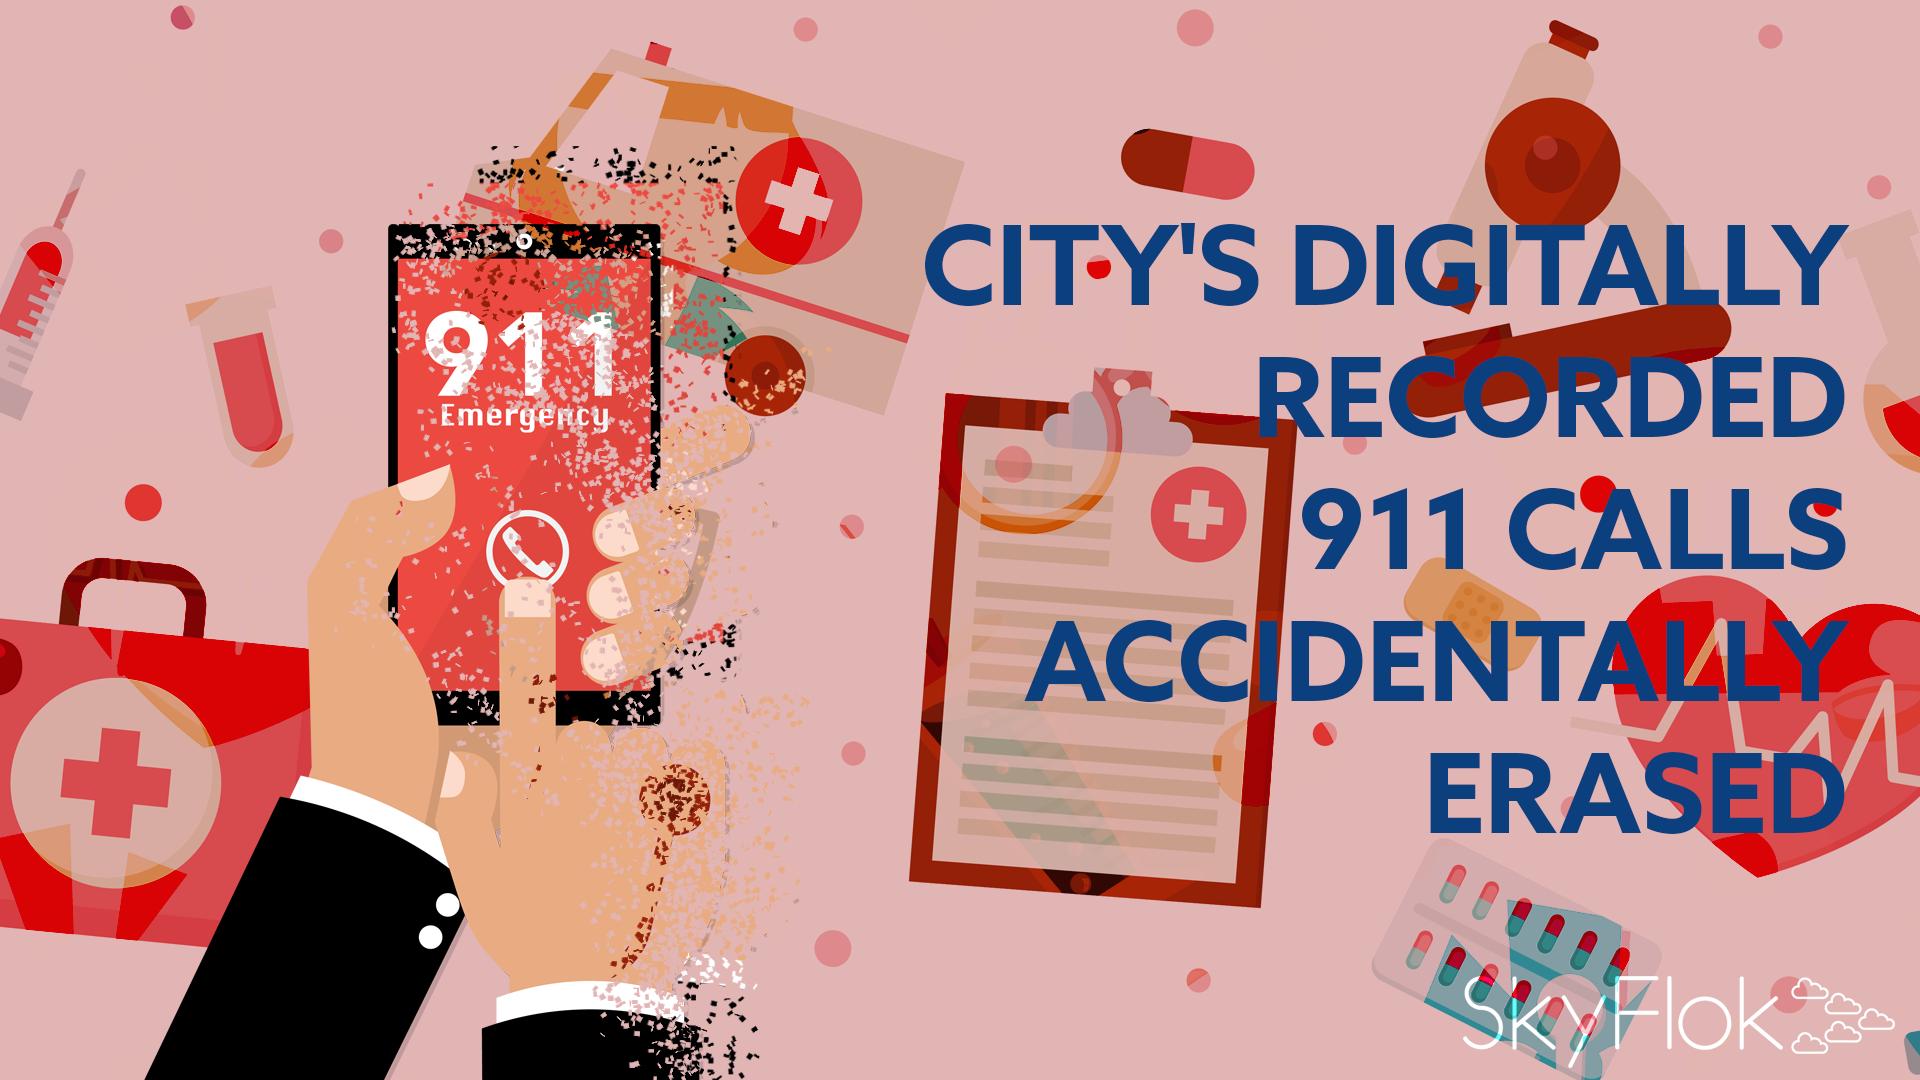 City's digitally recorded 911 calls accidentally erased